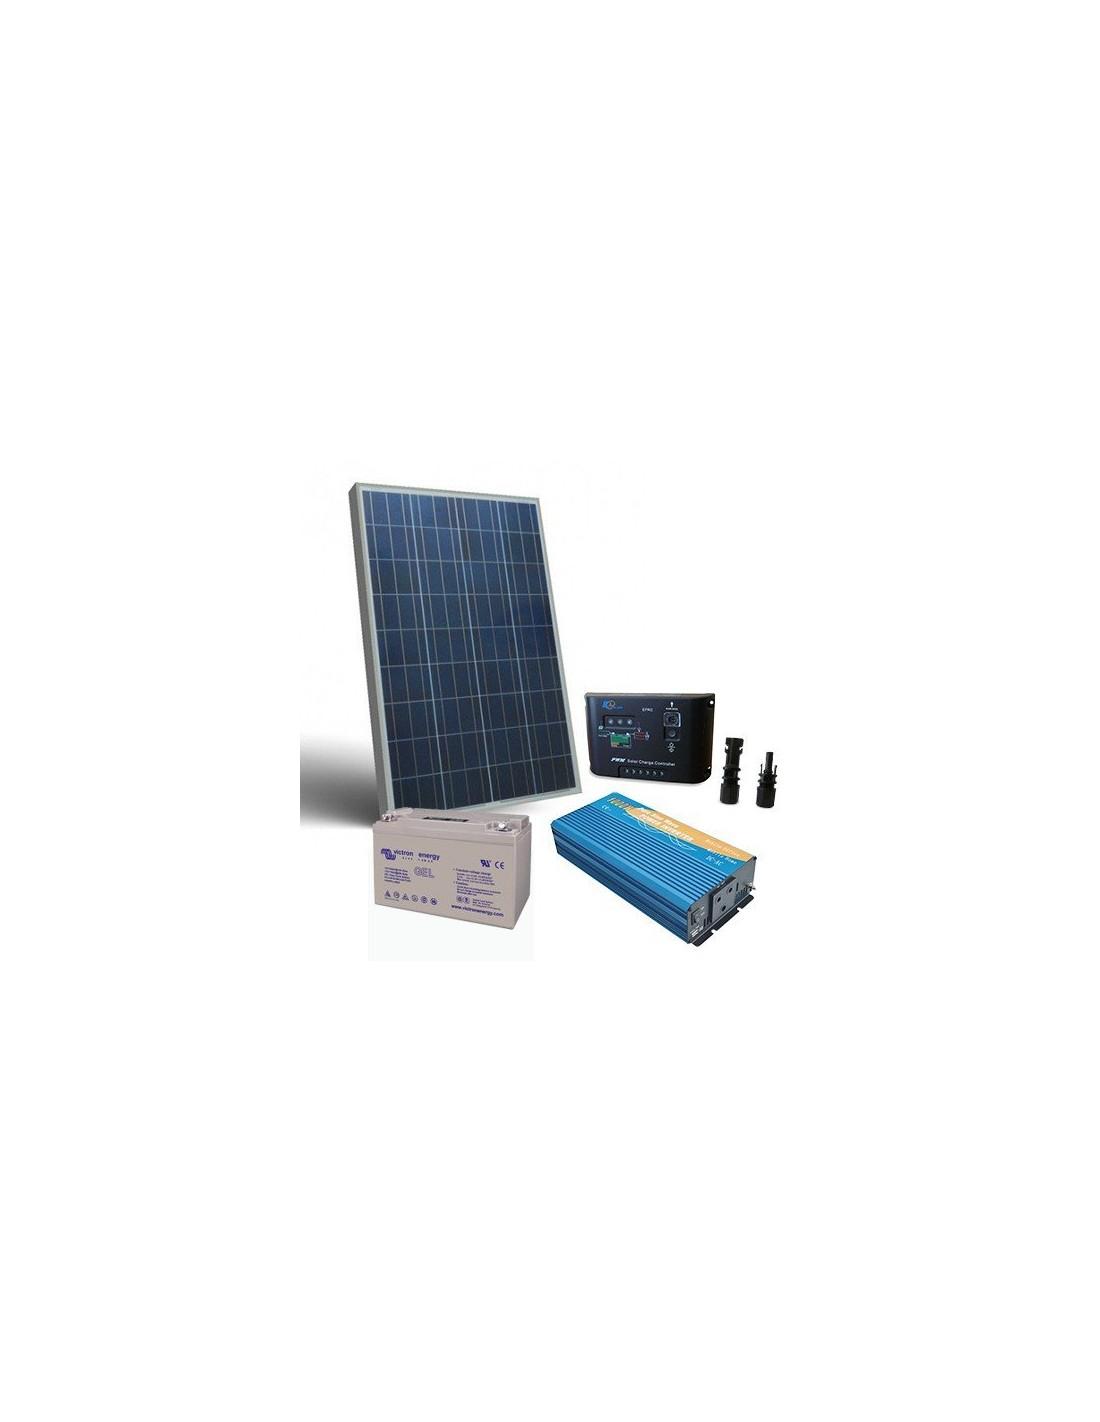 Kit Pannello Solare Batteria Inverter : Kit solare baita w v pro pannello inverter batteria